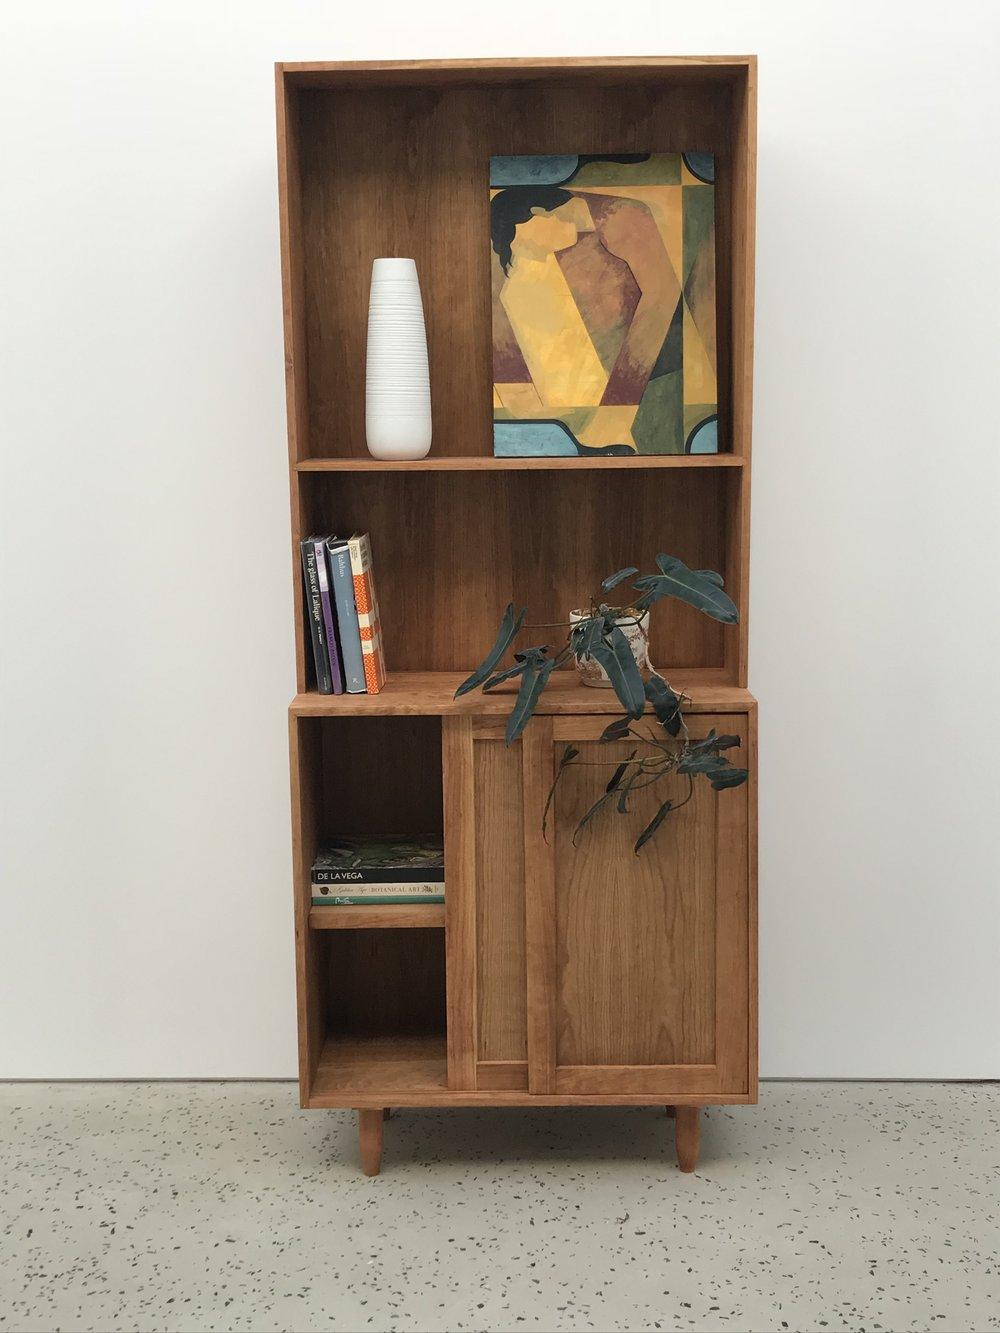 cabinetry - custom cabinets, storage, bookshelves